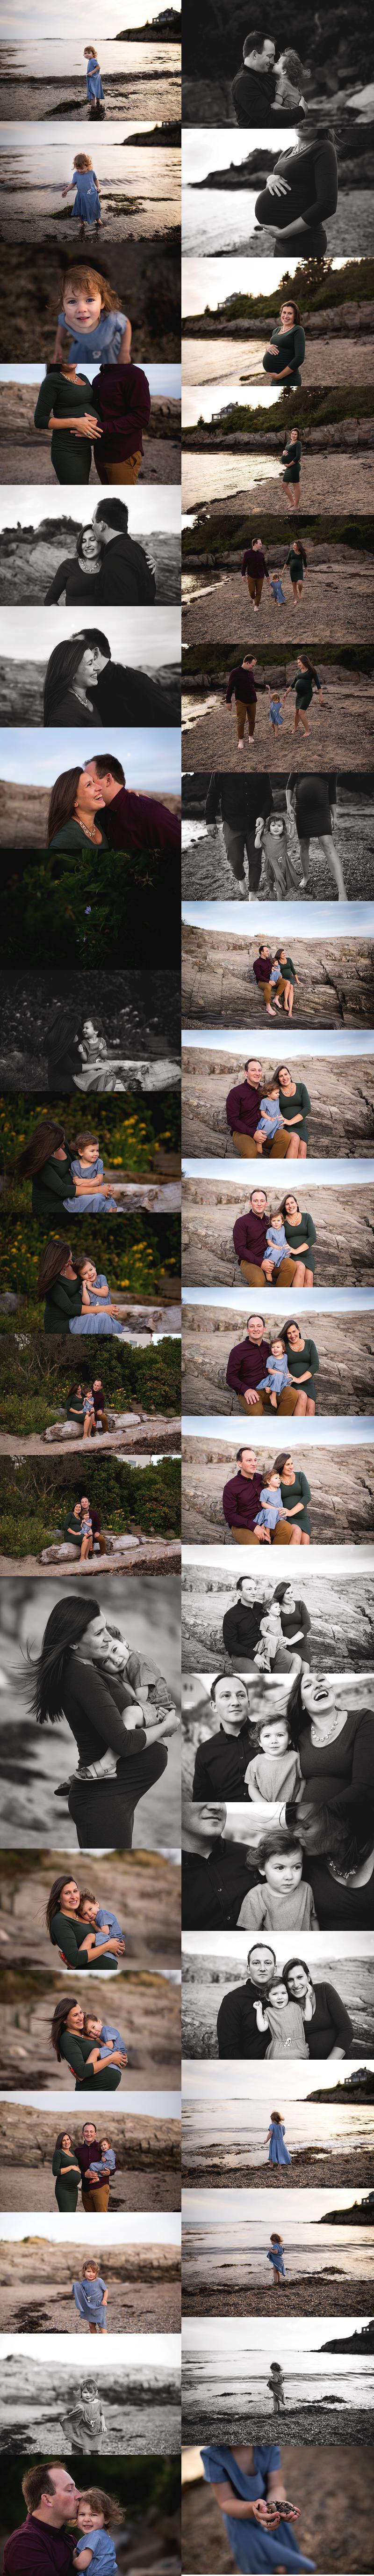 Portland Maine Photographer at Lands End